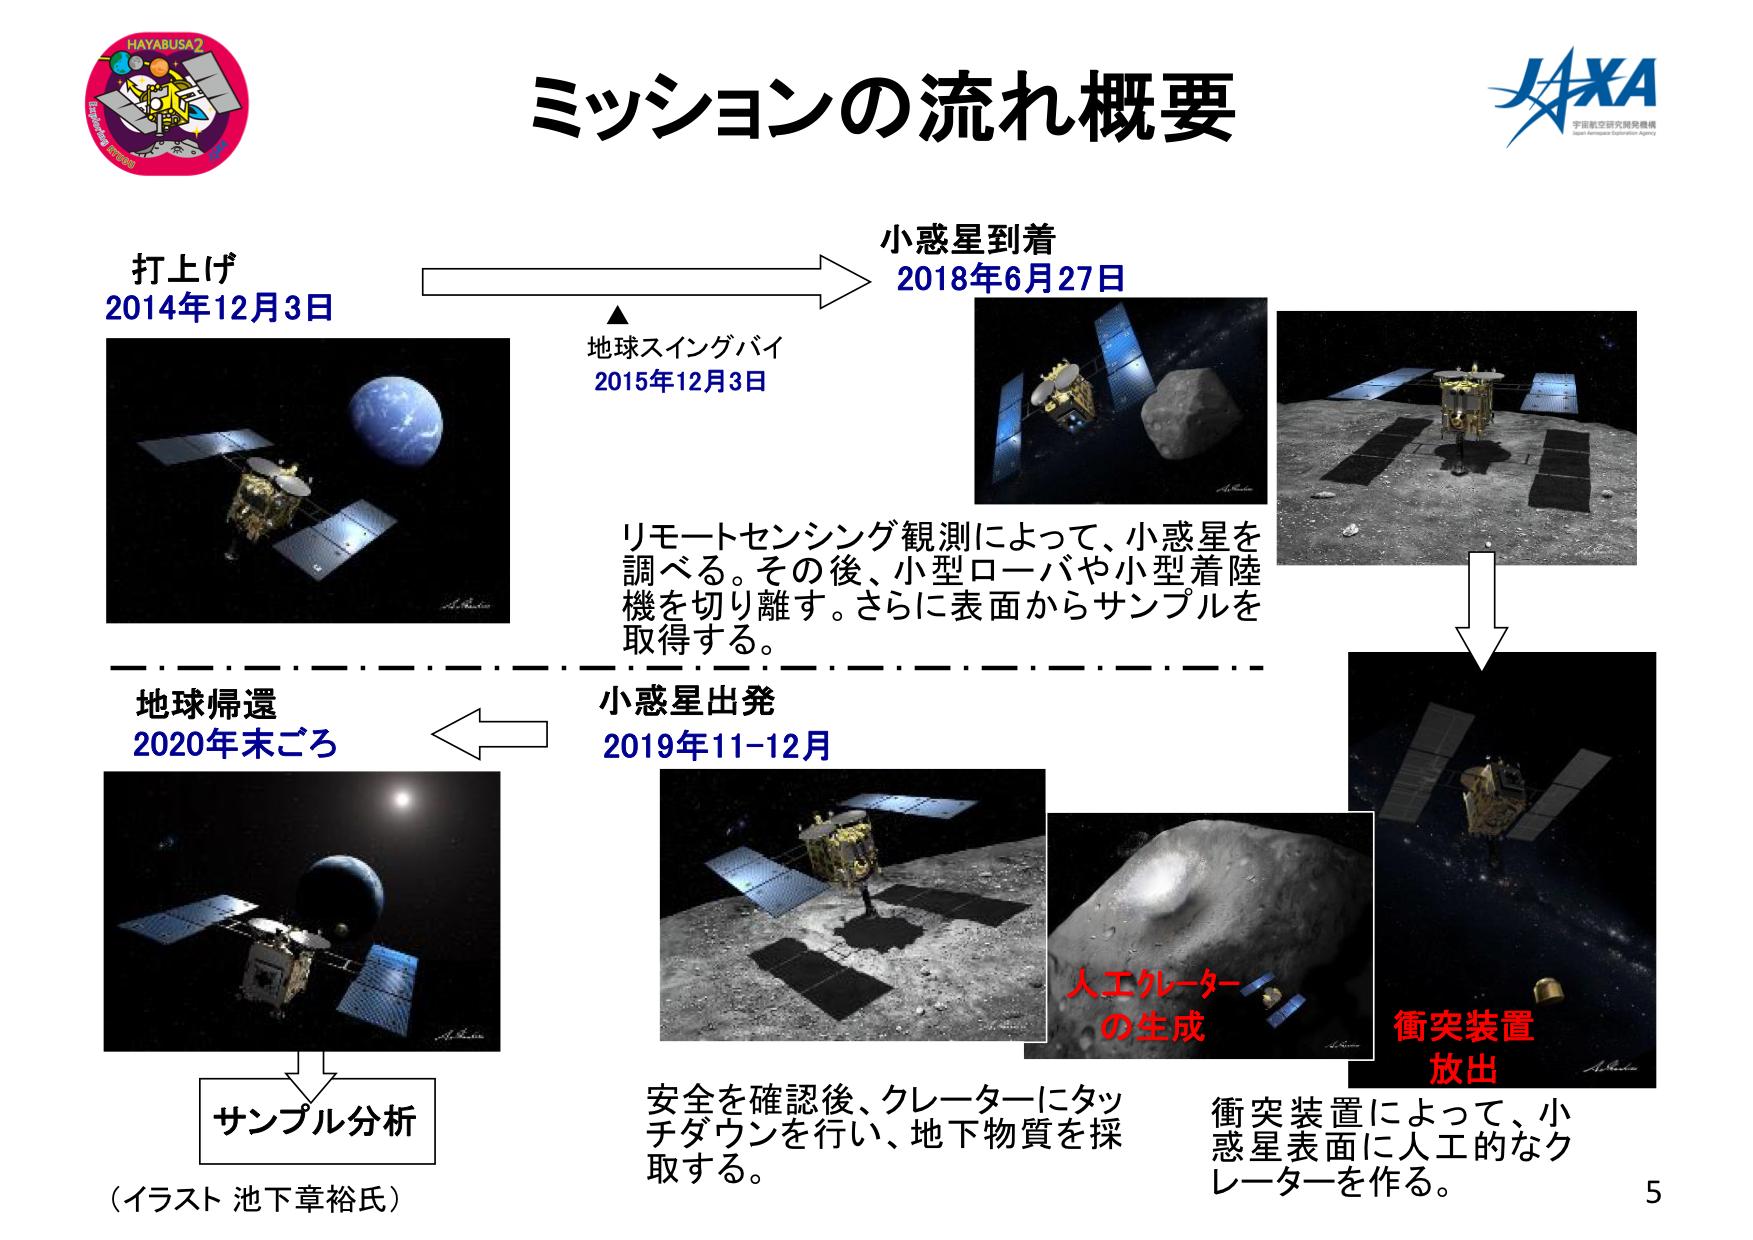 f:id:Imamura:20180905231937p:plain